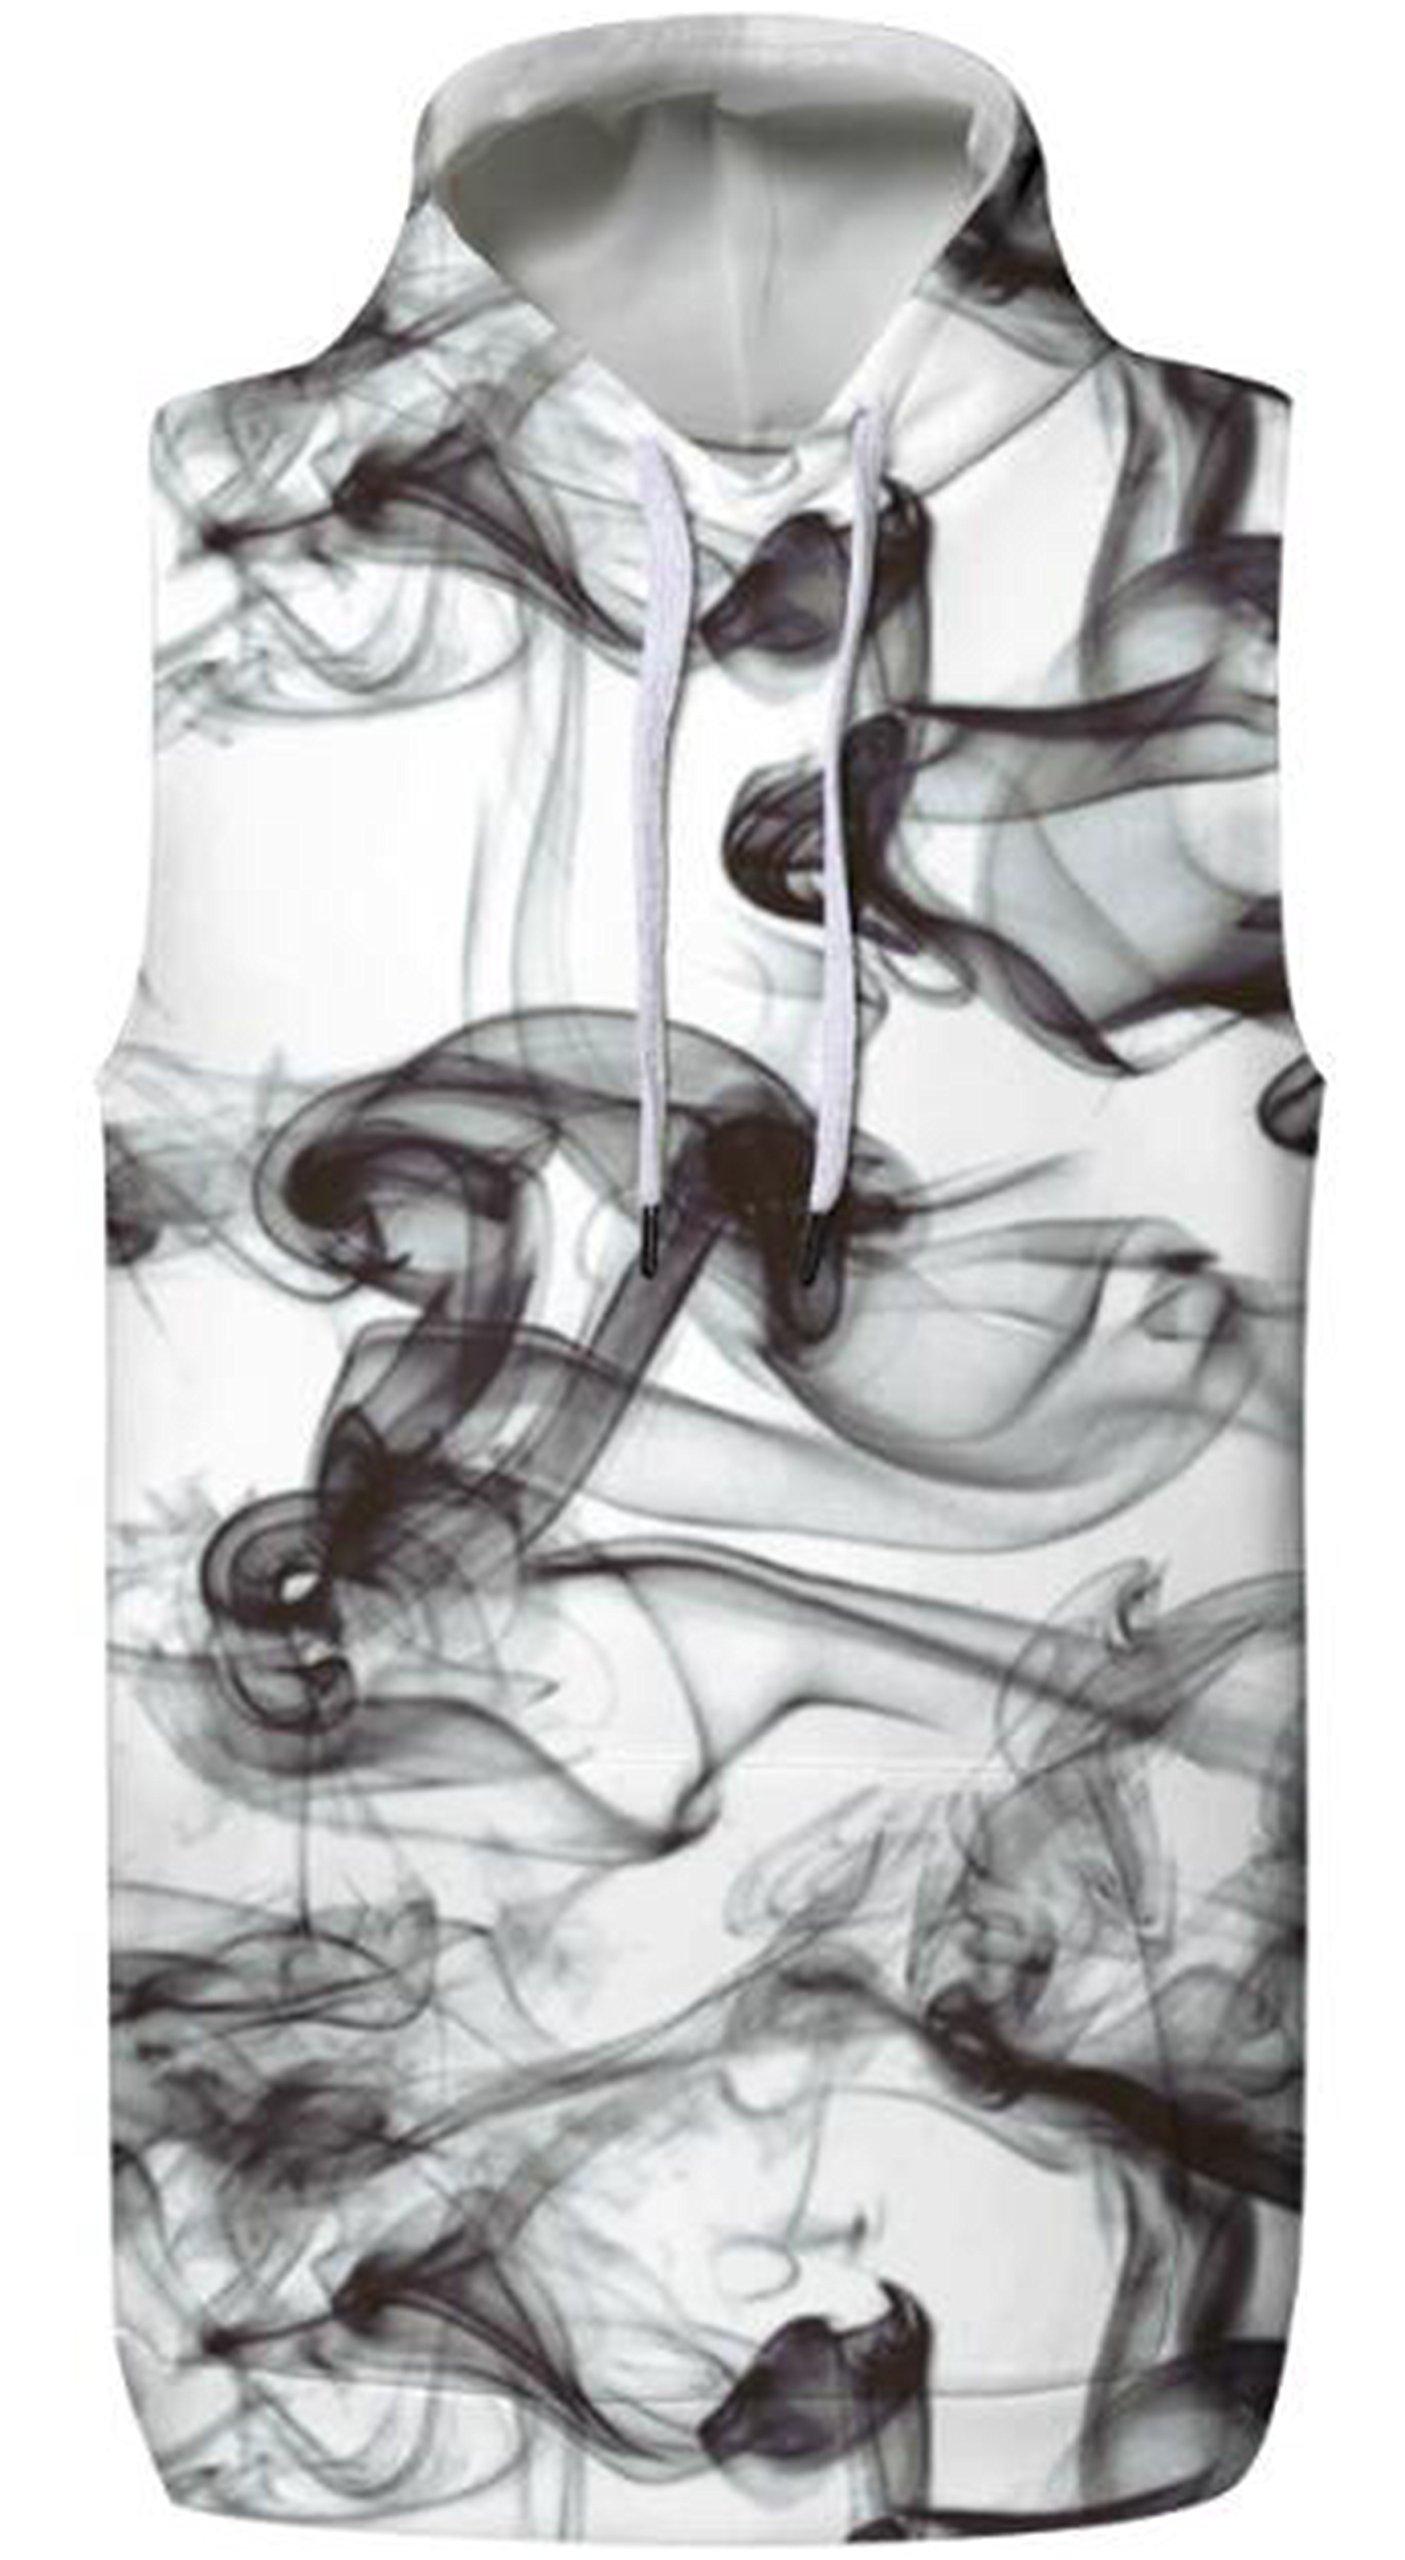 SAINDERMIRA Unisex Fashion 3D Digital Galaxy Hooded Waistcoat Vests Sleeveless T-Shirt With Pockets(Ink Painting,S/M)